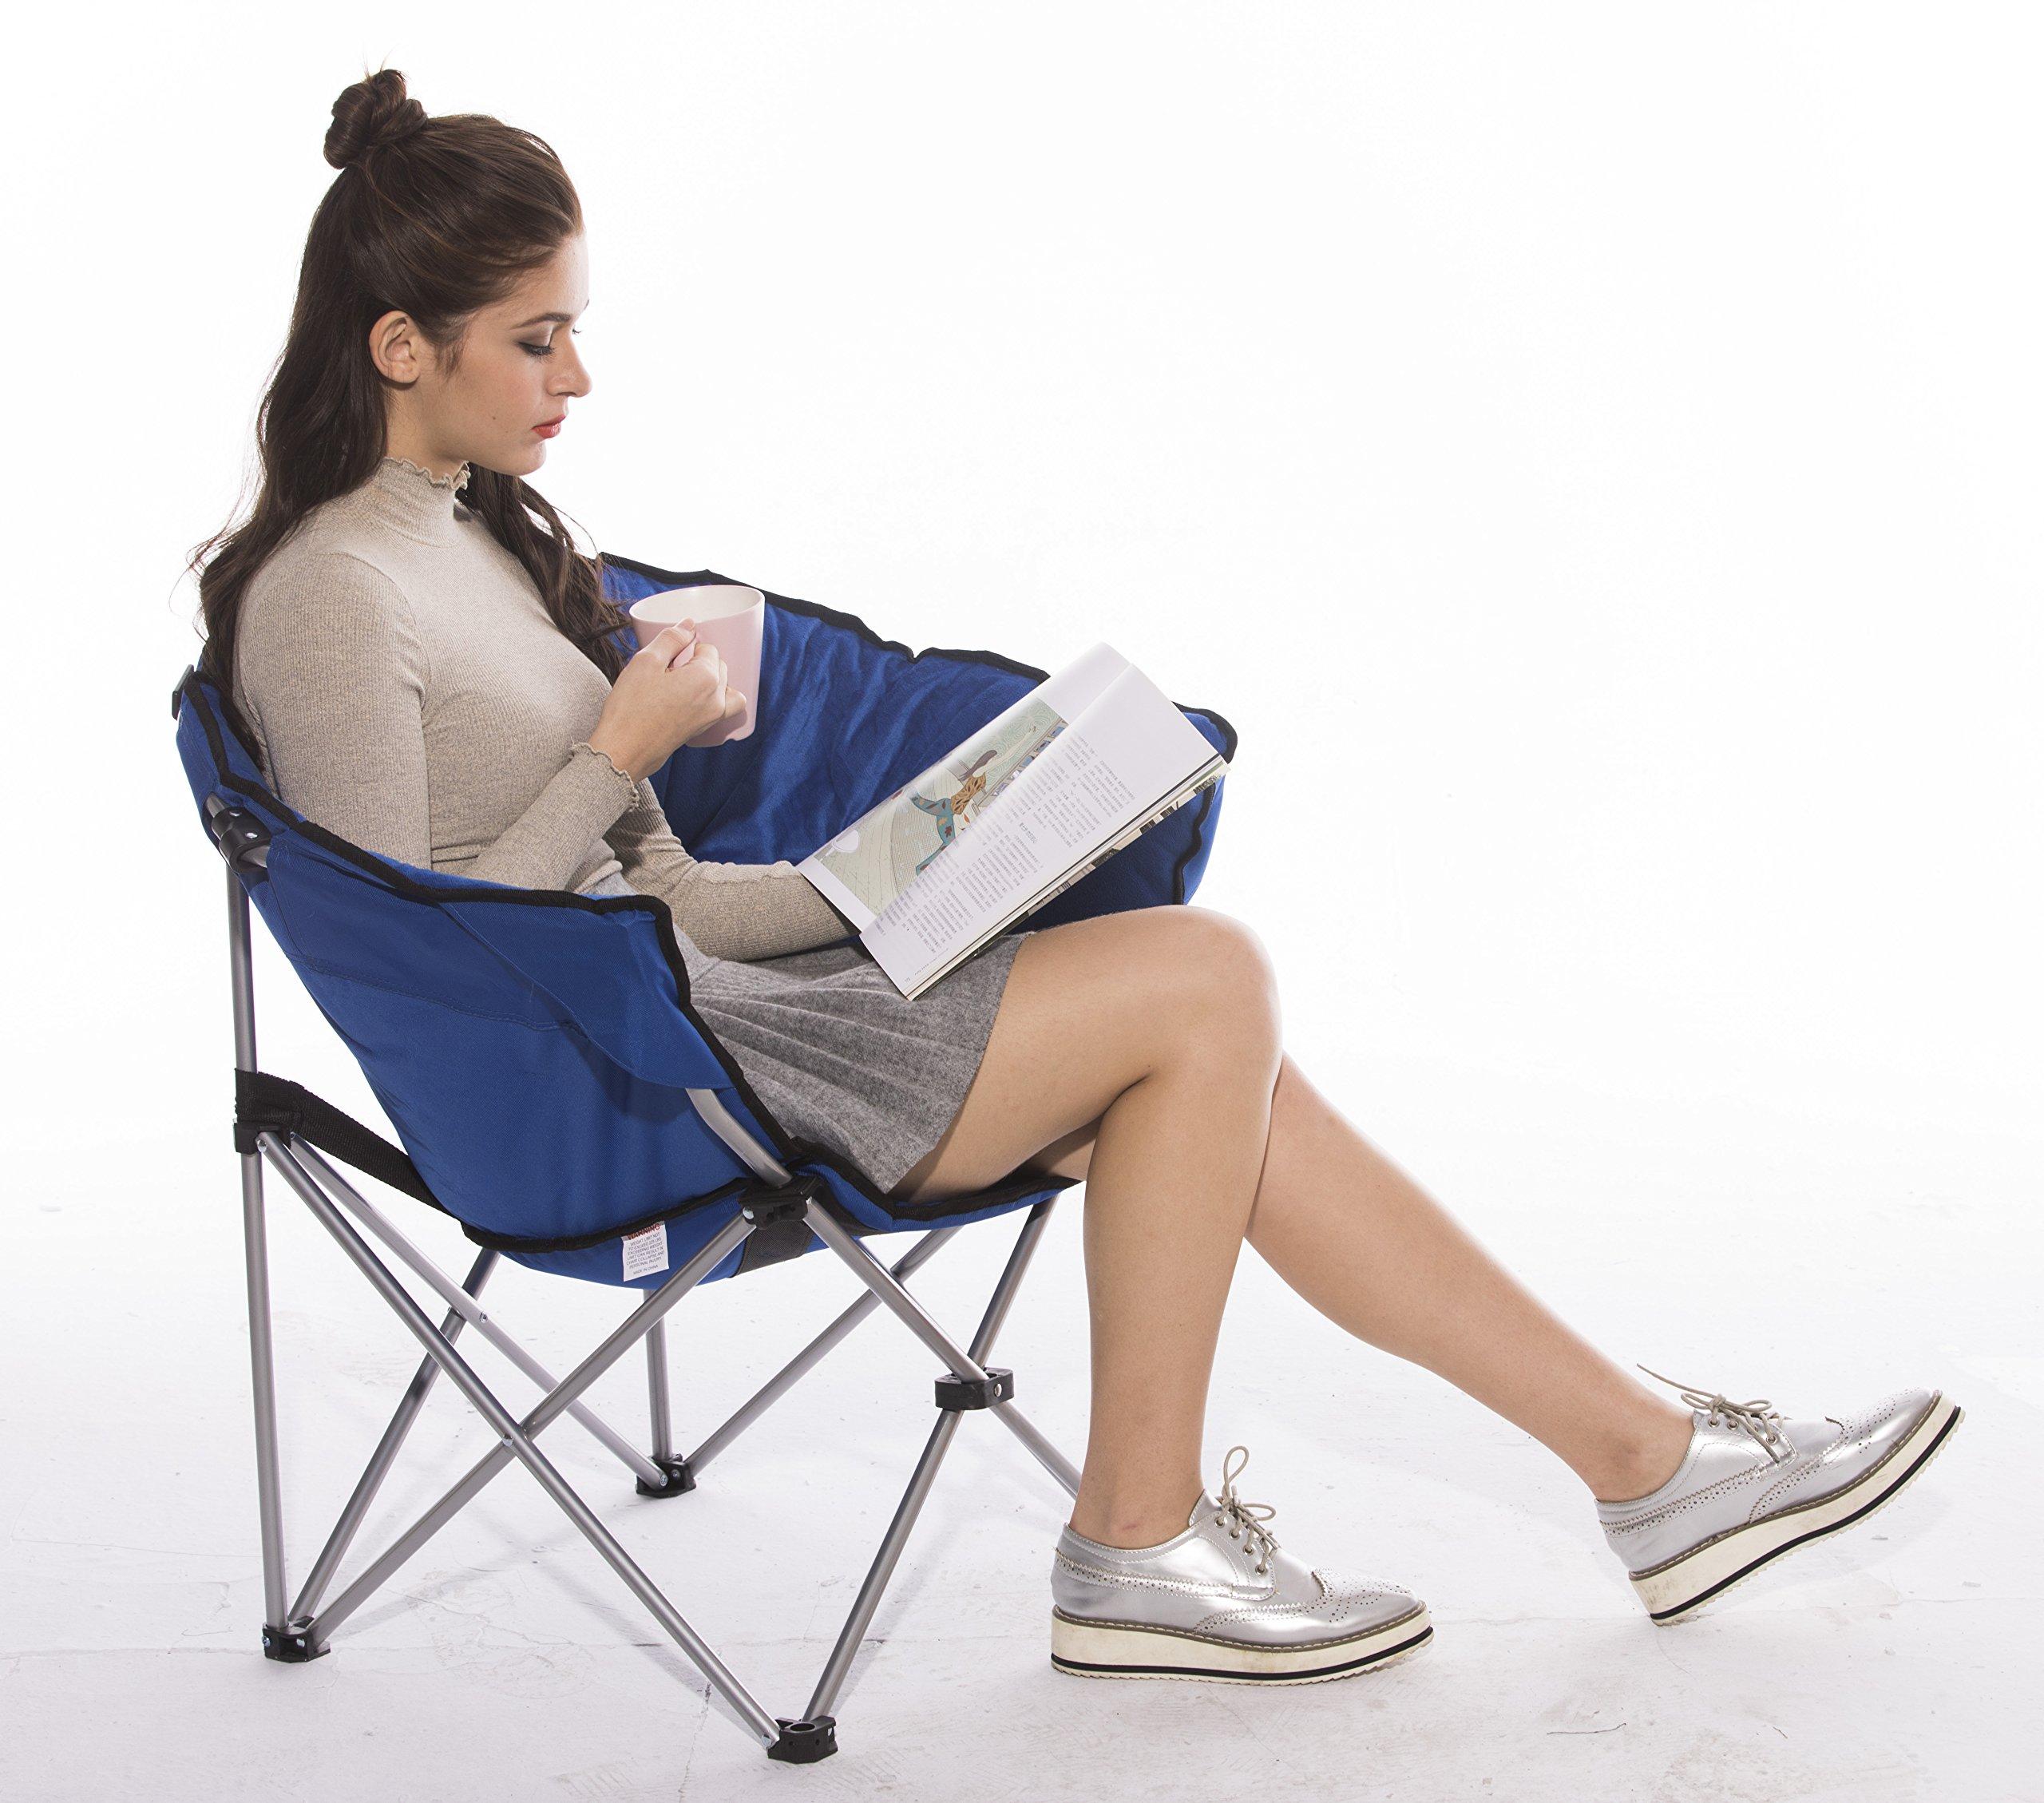 GOJOOASIS Foldable Moon Saucer Chair Club Seat for TV Living Room Dorm